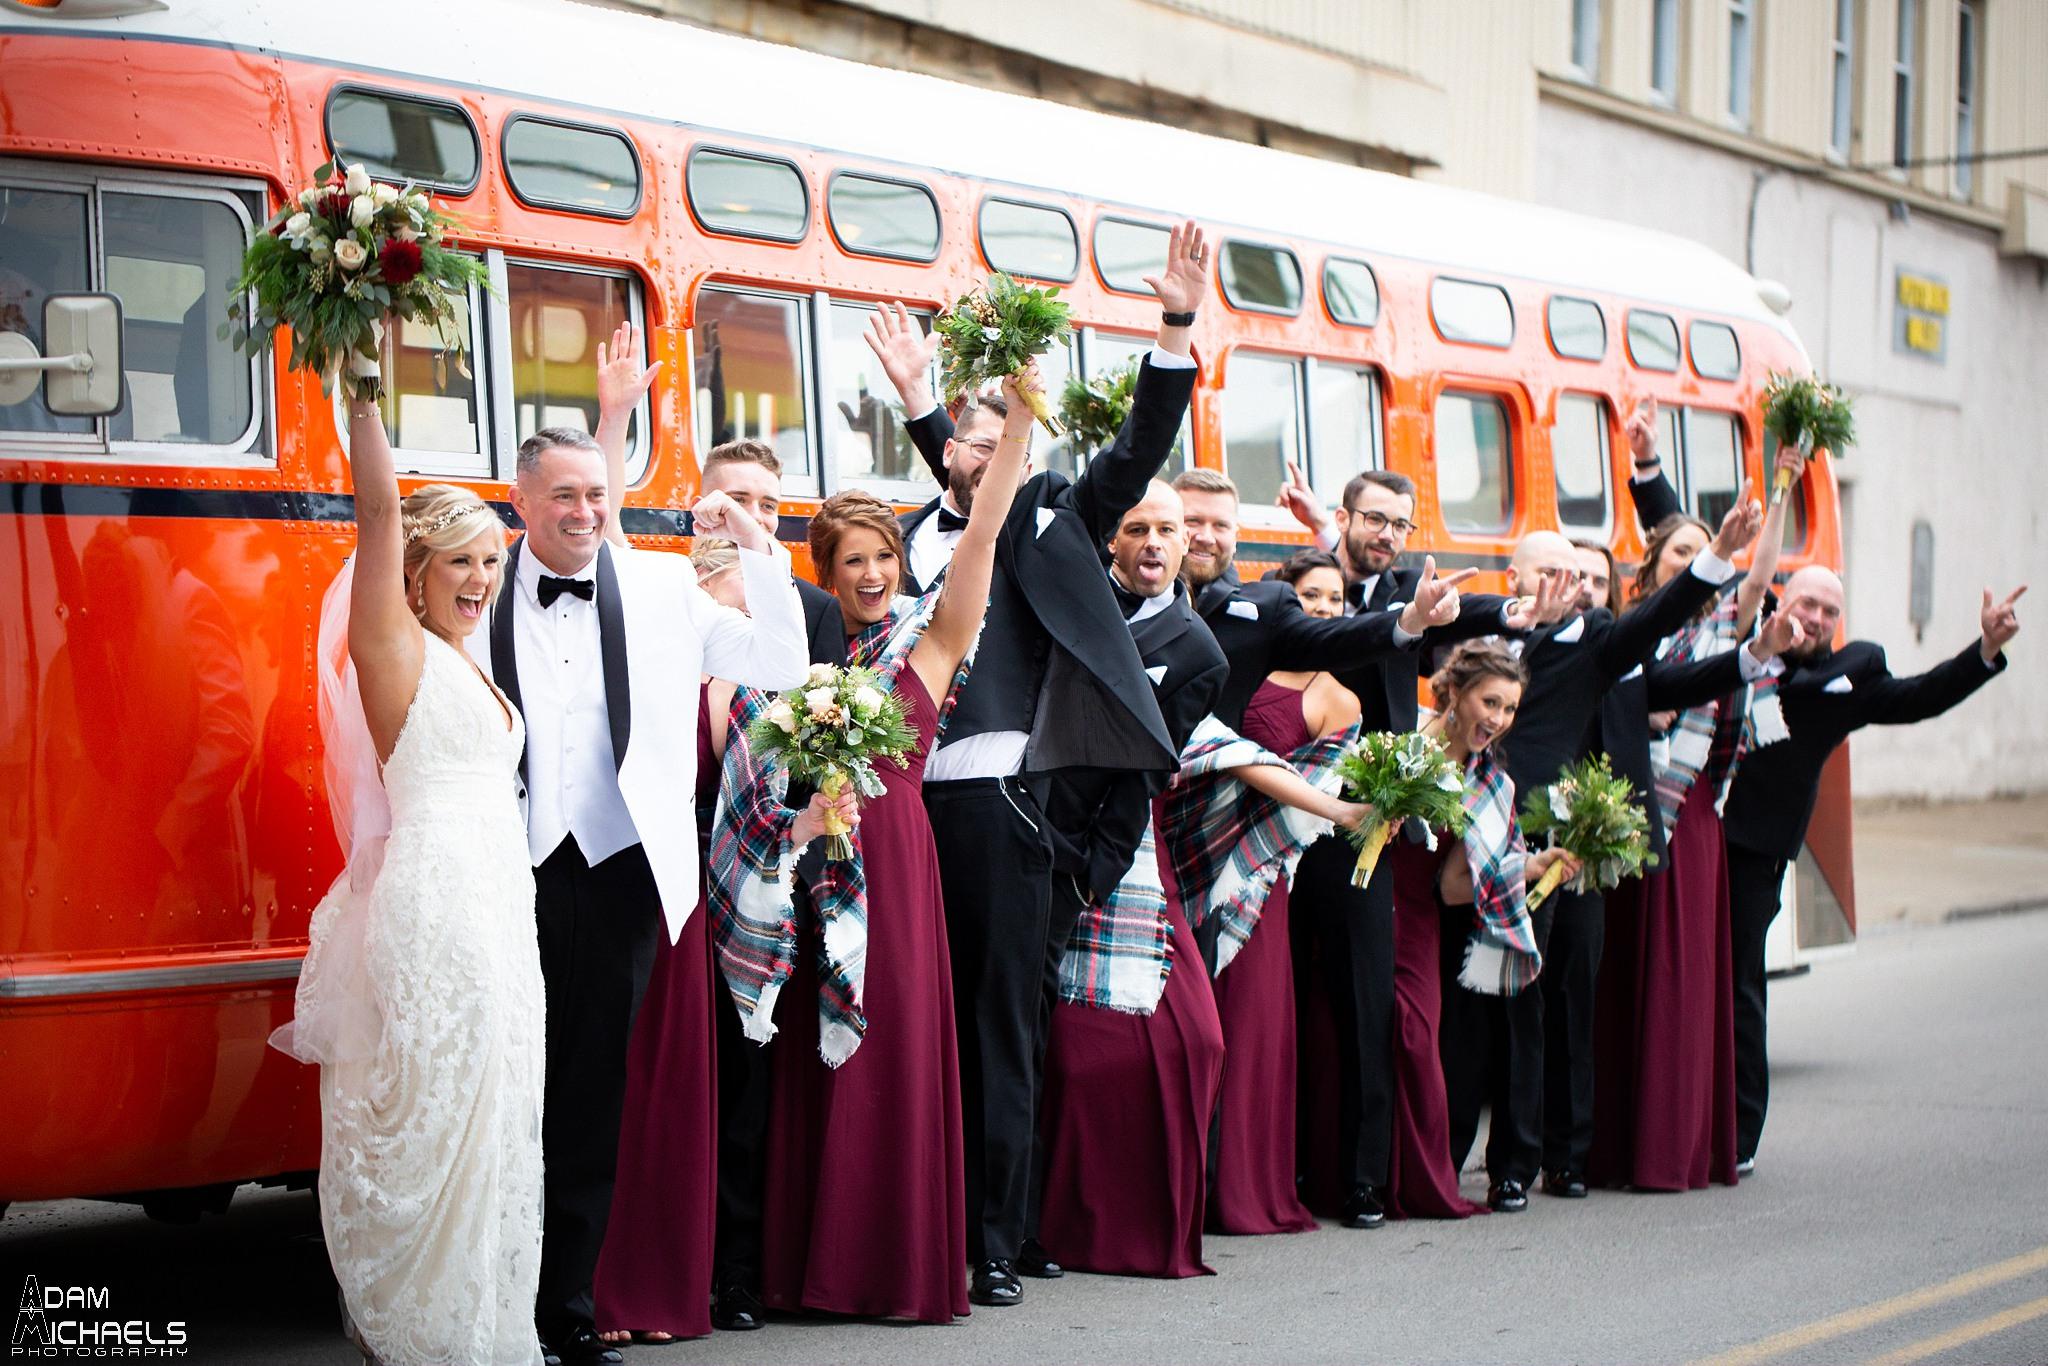 Pittsburgh Bus Wedding Pictures Trolley.jpg